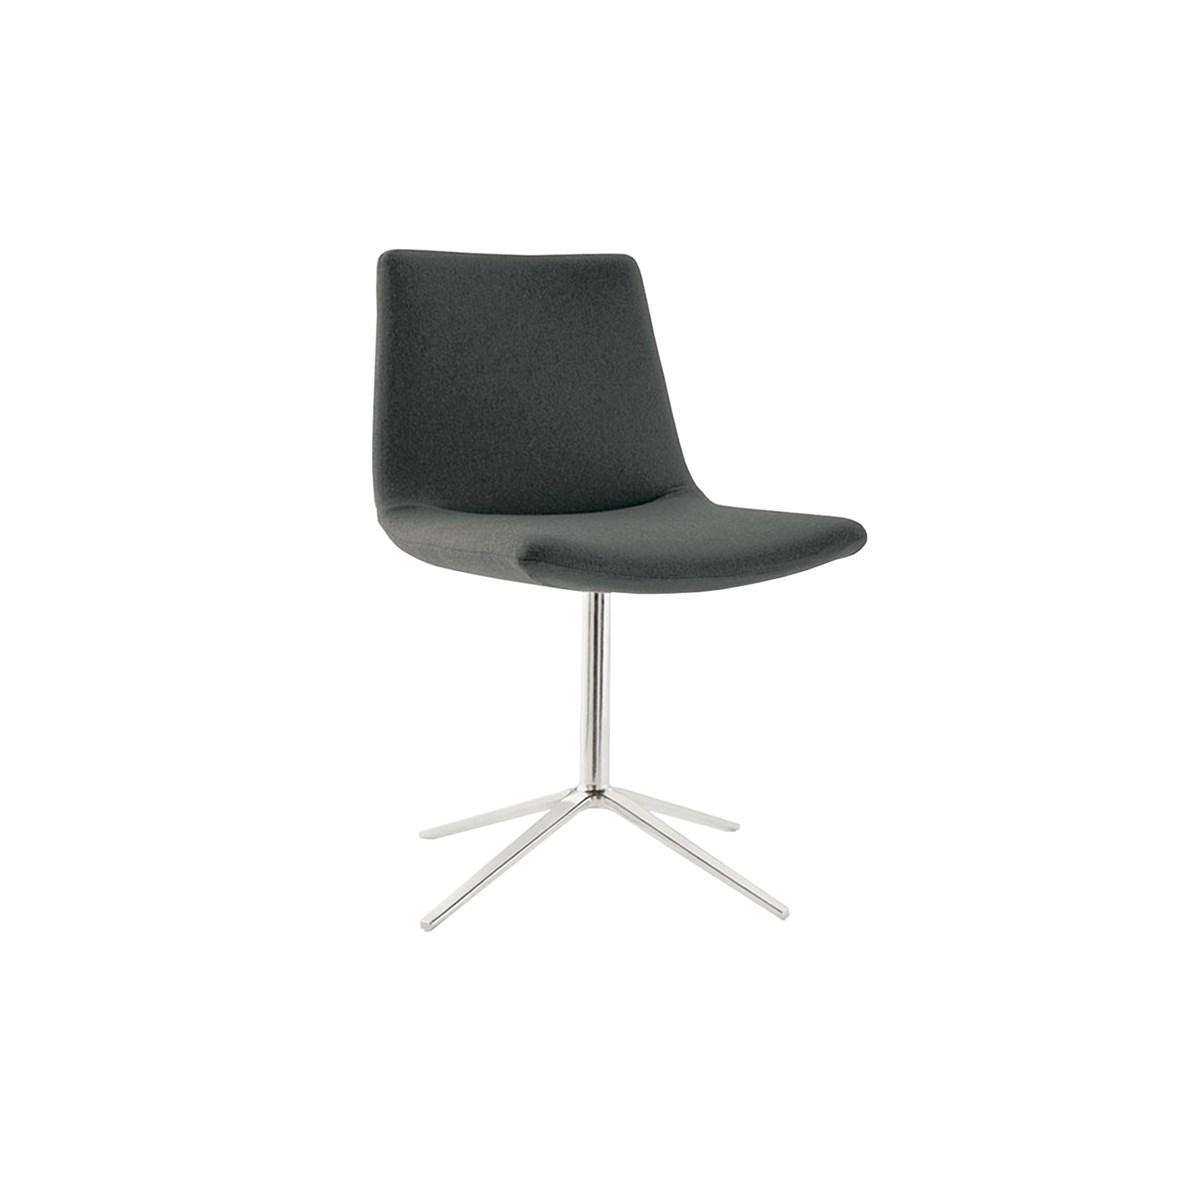 B&B-Italia-Jeffrey-Bernett-Cosmos-Chair-Matisse-1